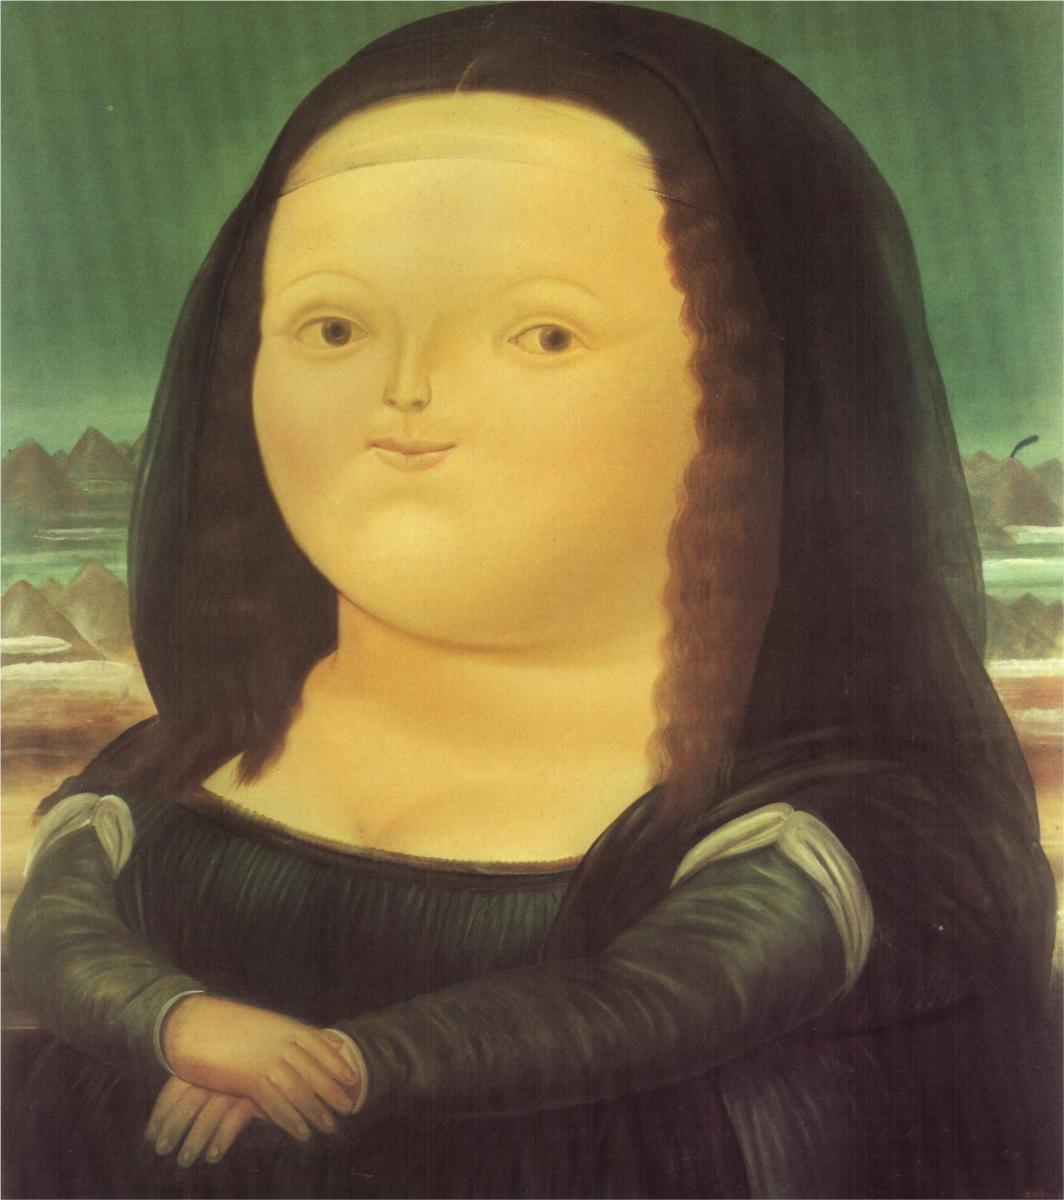 Botero-Mona_Lisa.jpg